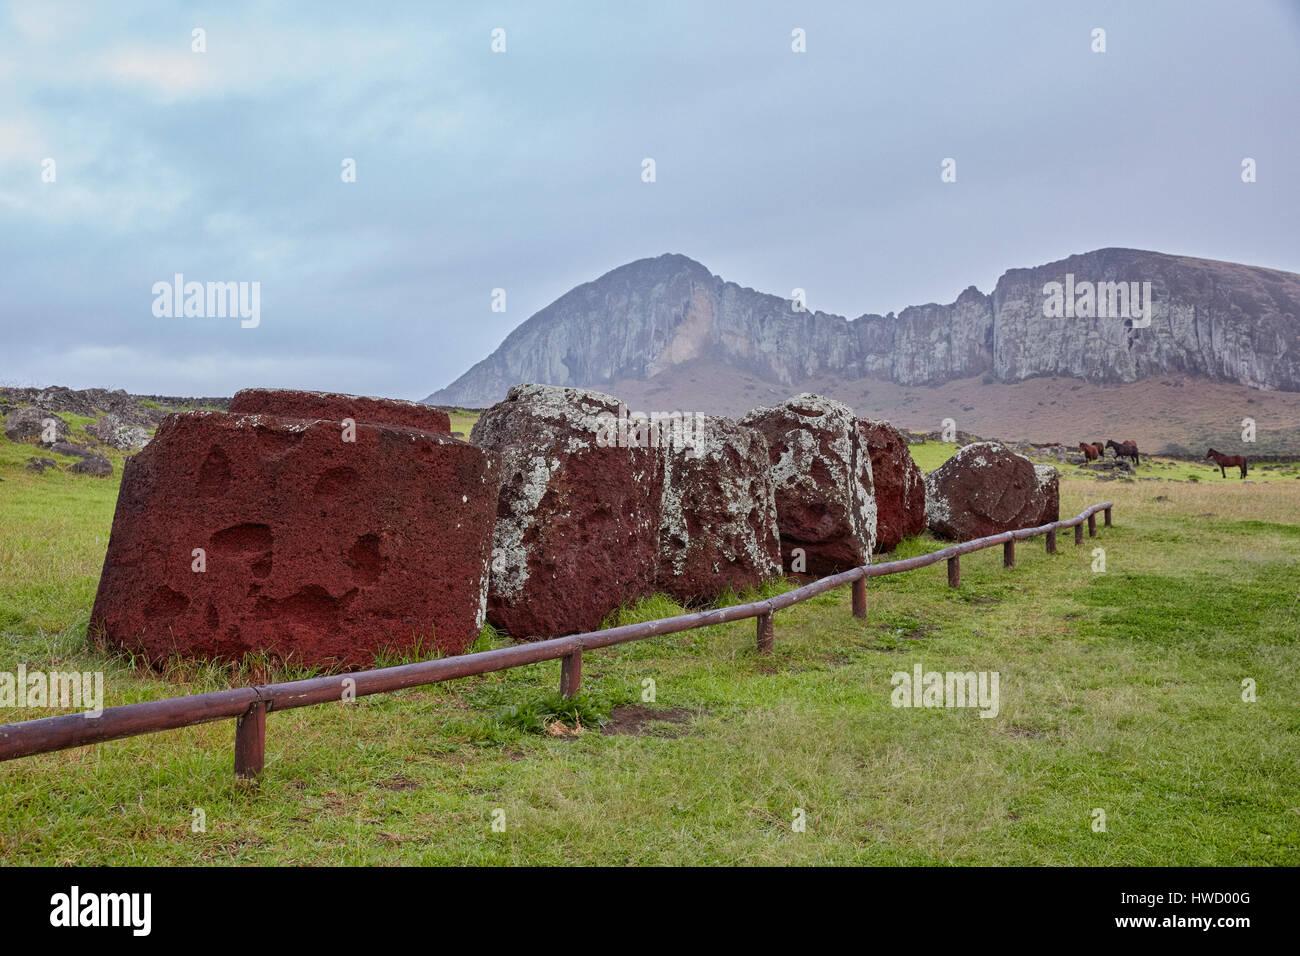 Pukao, top knots (hats), Ahu Tongariki, Rapa Nui, Easter Island, Isla de Pascua, Chile - Stock Image